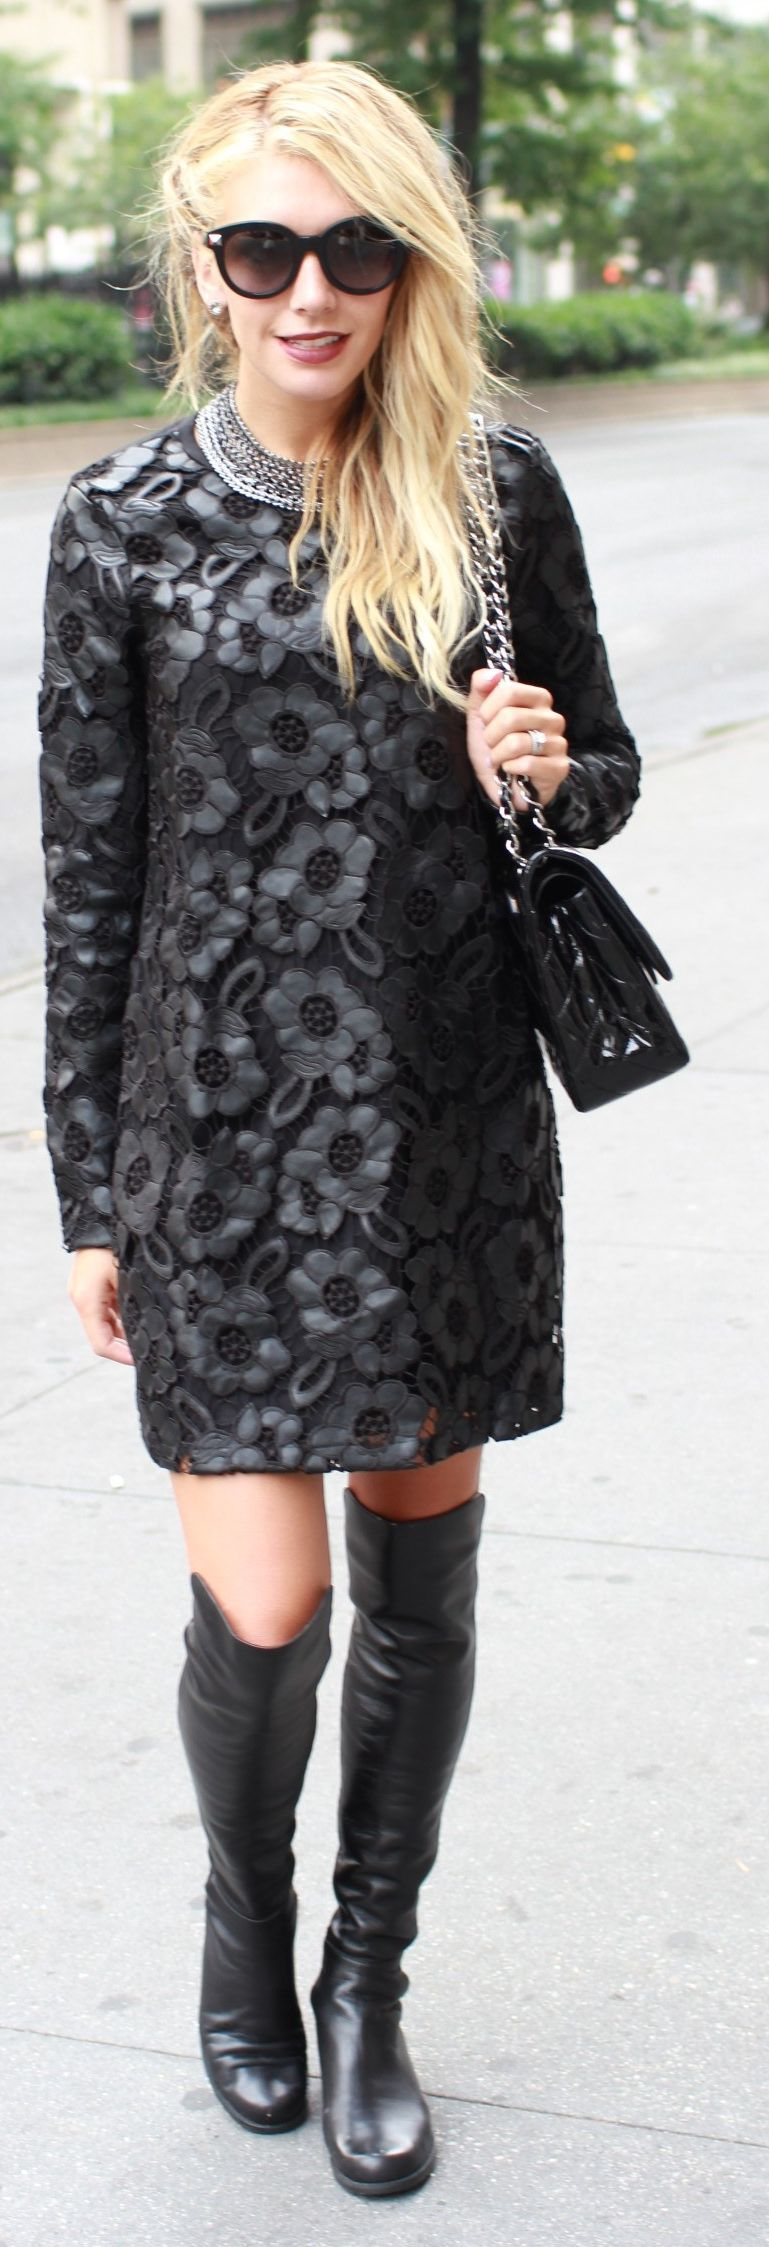 girls-black-dress-coats-carmella-bing-desnuda-sexy